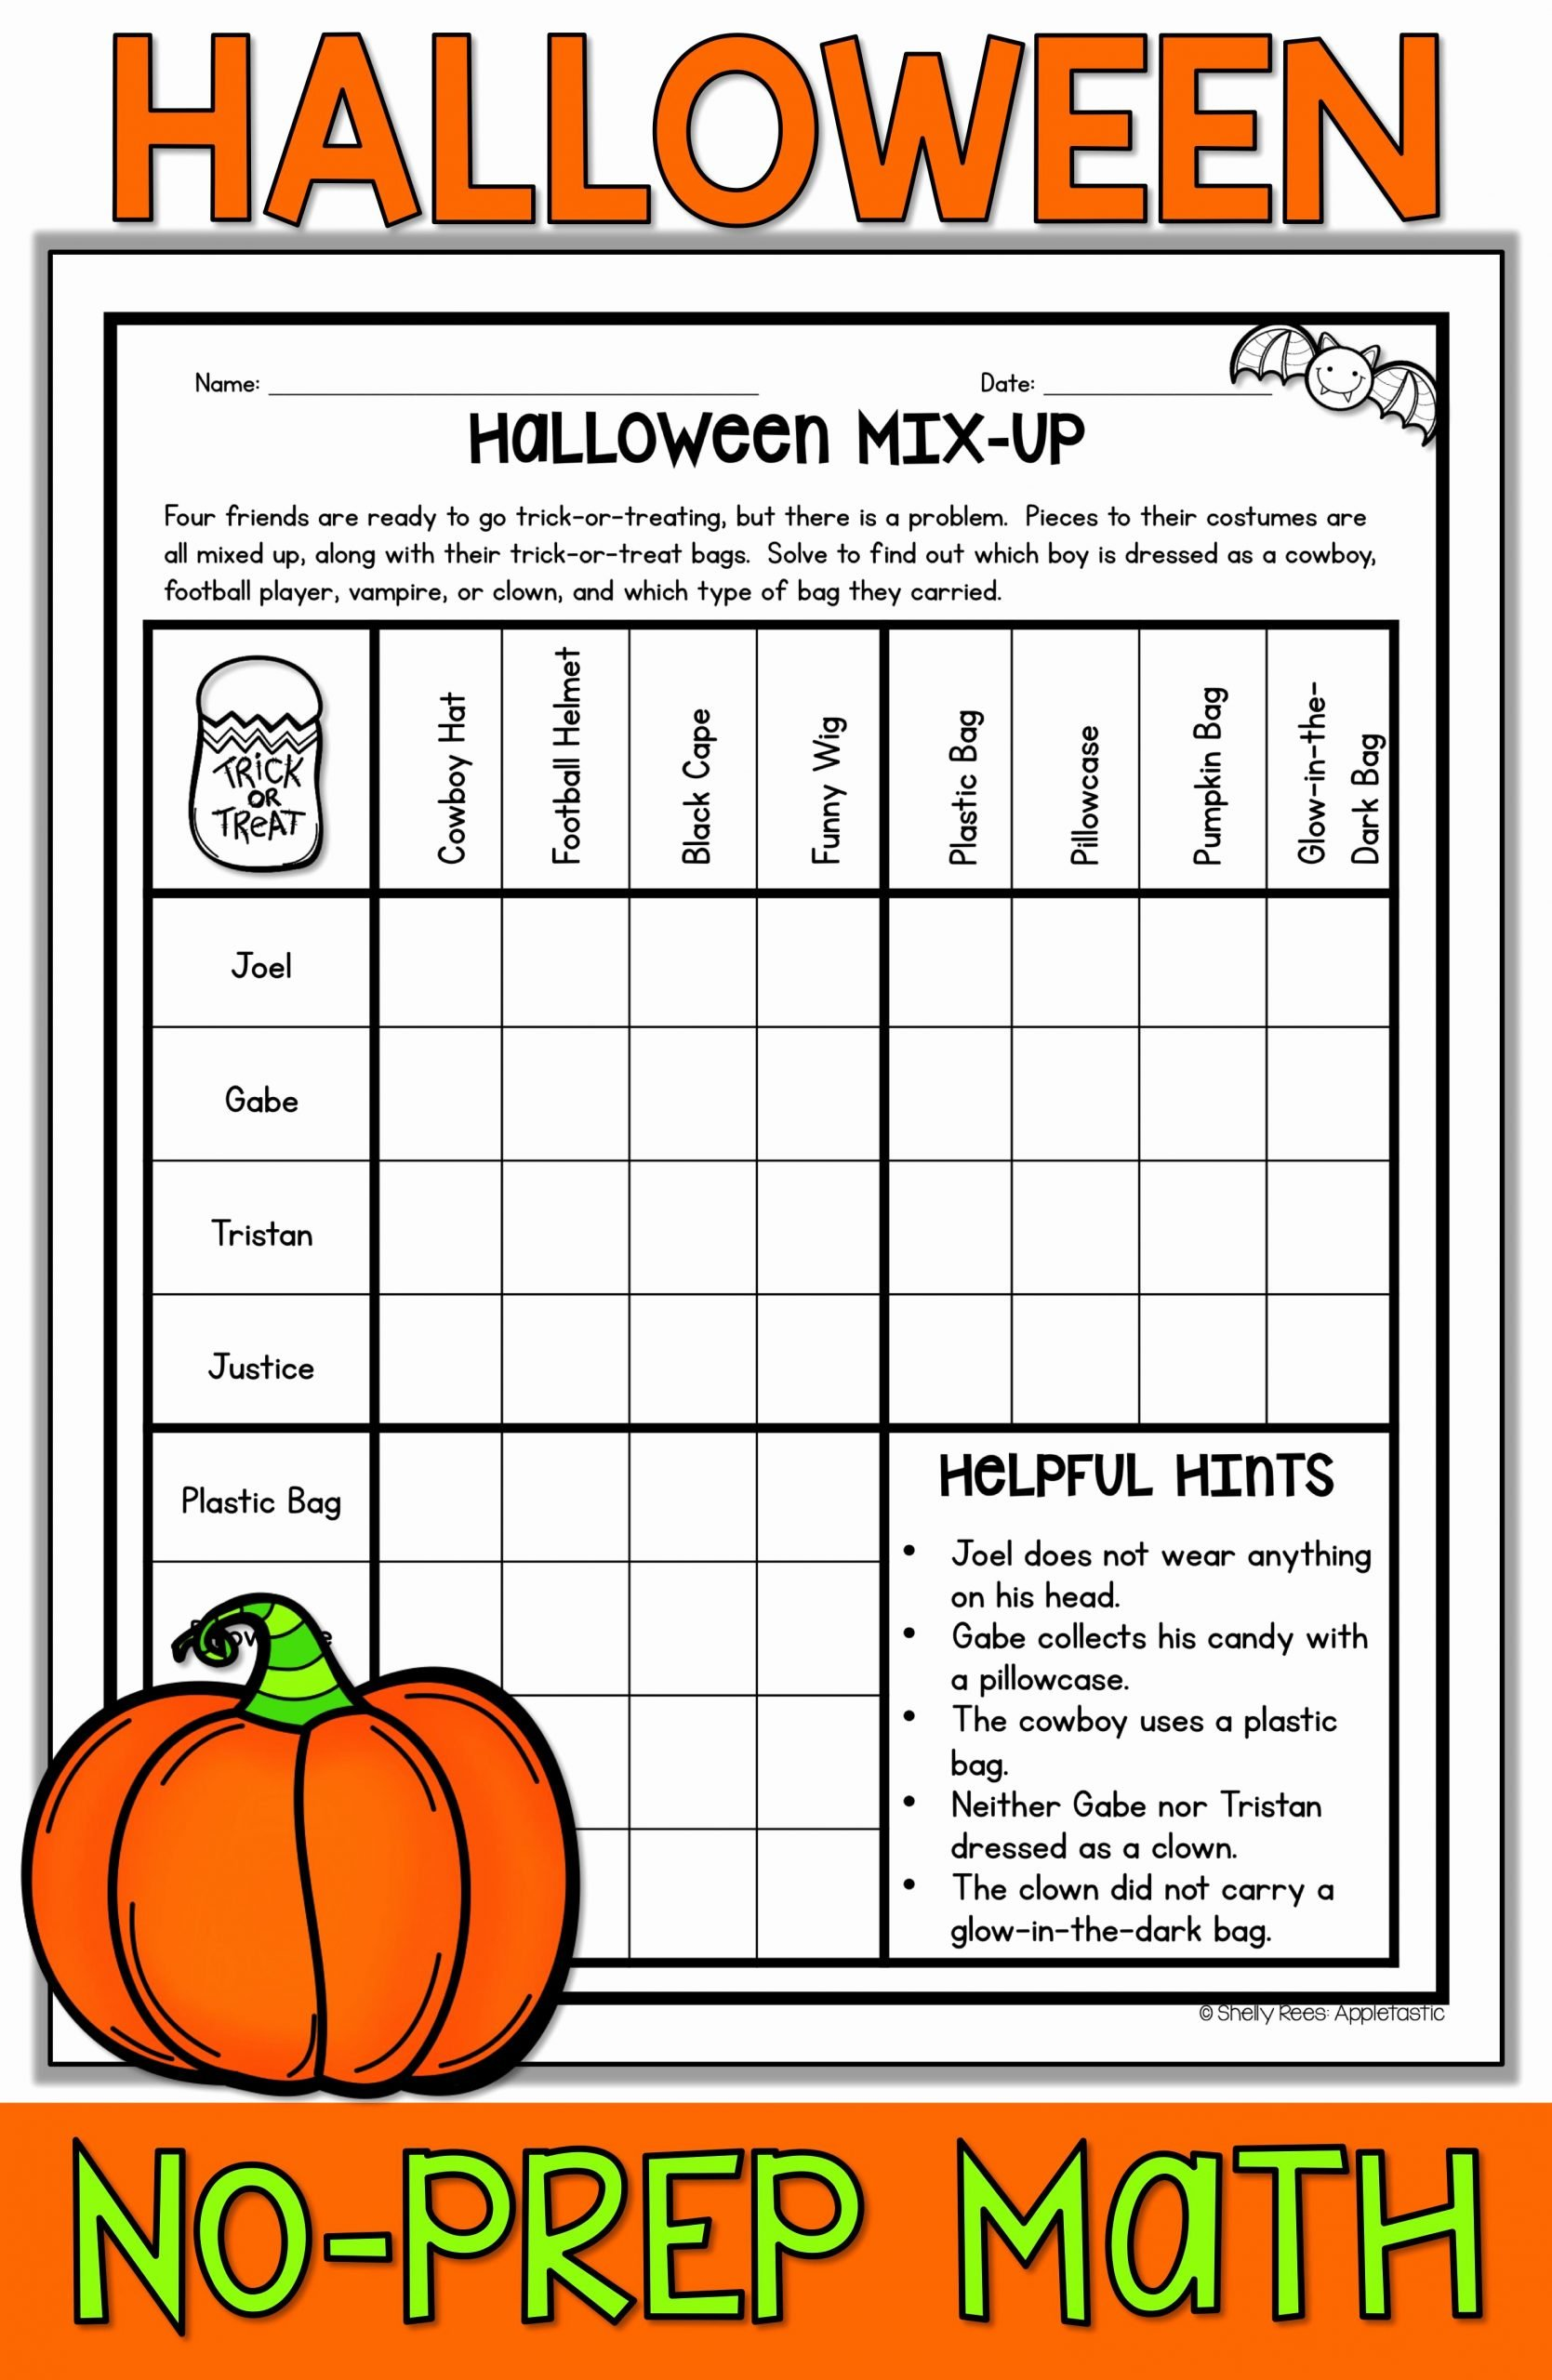 Halloween Math Worksheets Middle School Printable Halloween Math Worksheets